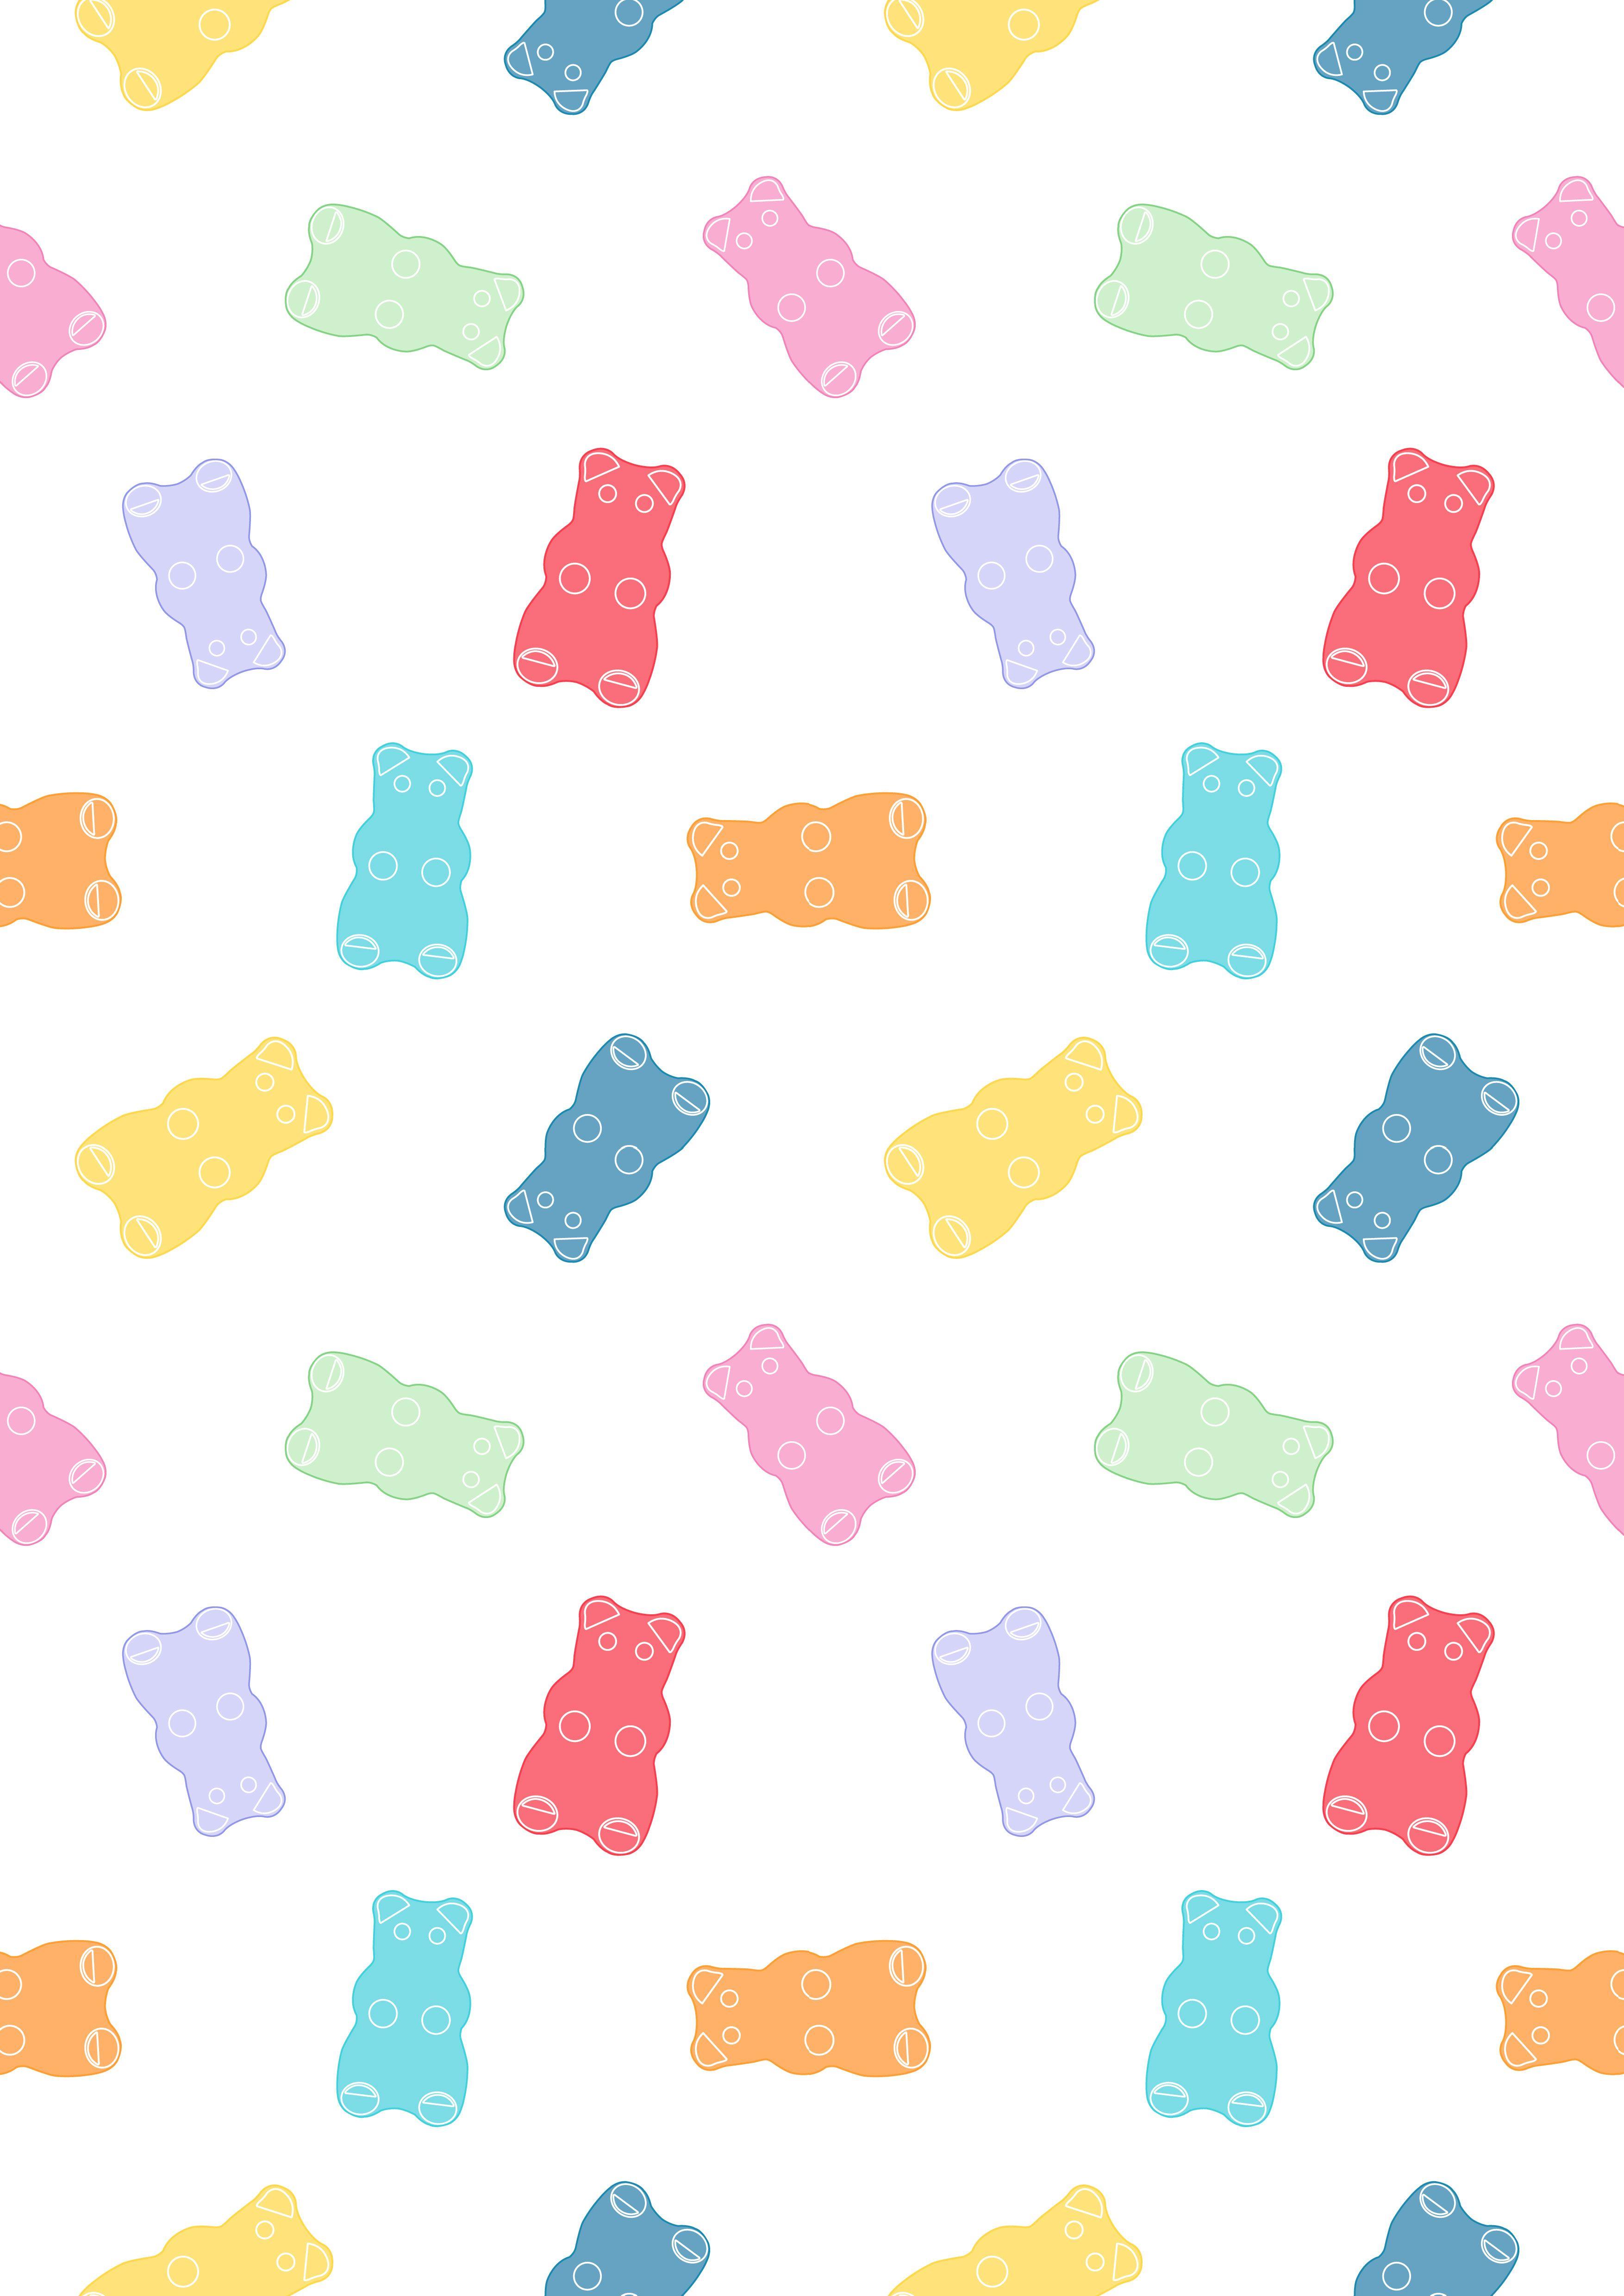 Gummy Bear Pattern Repeat สม ดออร แกไนเซอร วอลเปเปอร ด สน ย